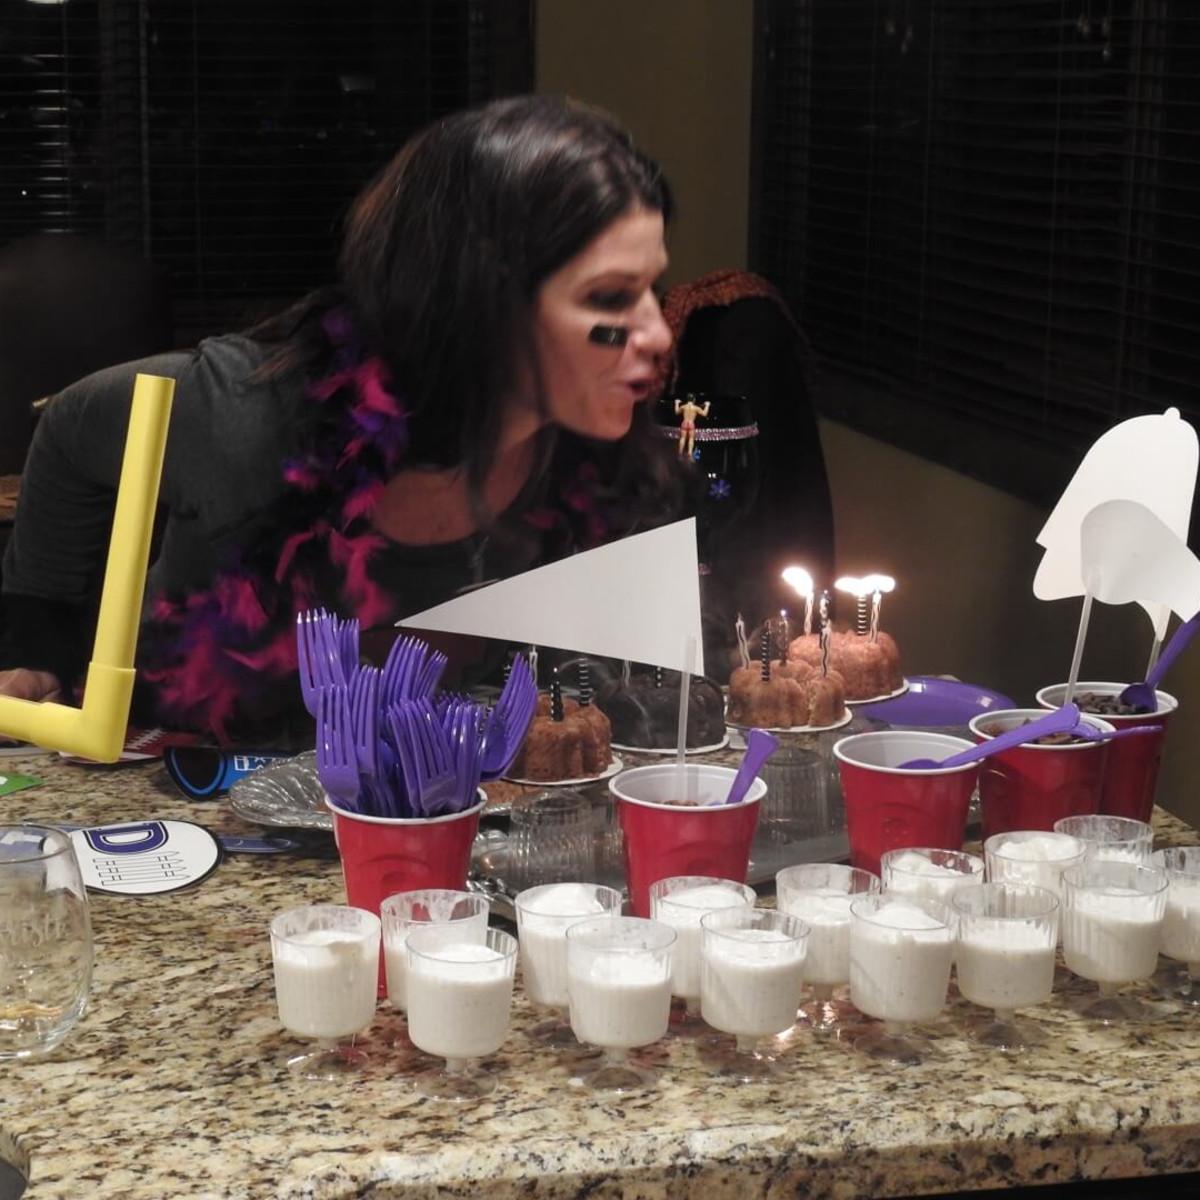 Laura Davenport celebrating birthday with a tailgate theme at Schatzman Sundance house party